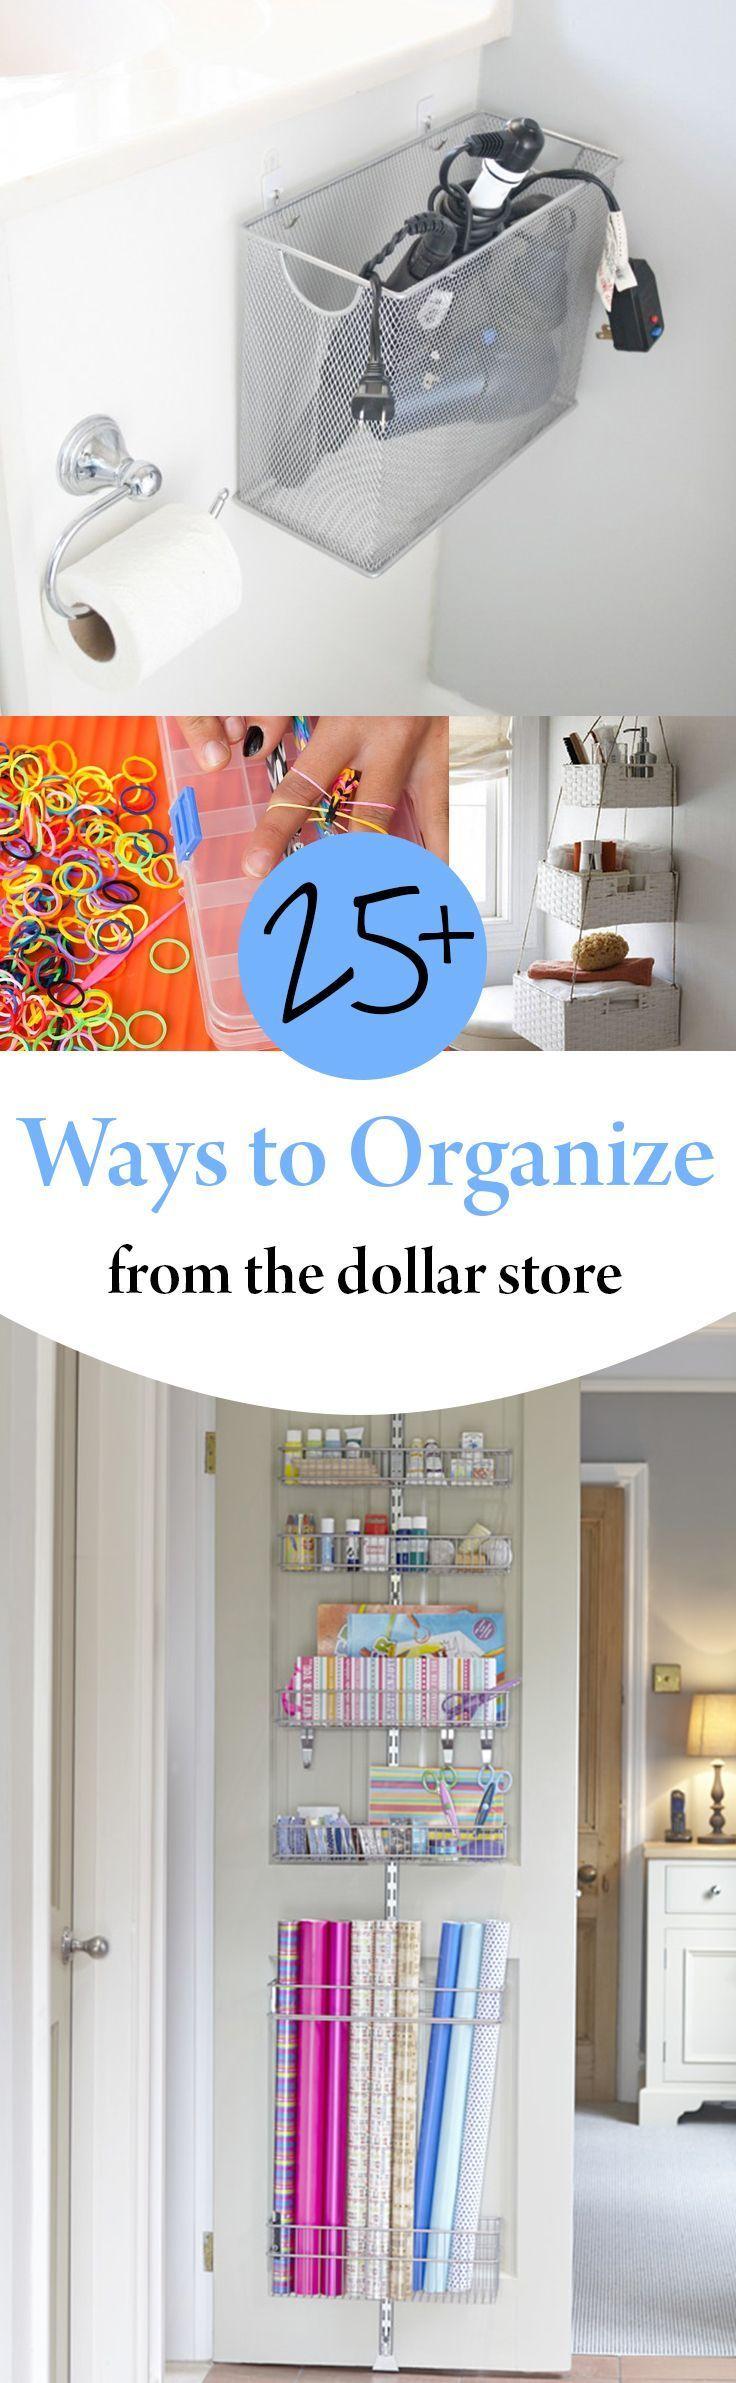 Organization, Home Organization, Home Organization Hacks, Organized Home, DIY Home, Popular Pin, Home Decor, Dollar Store Organization